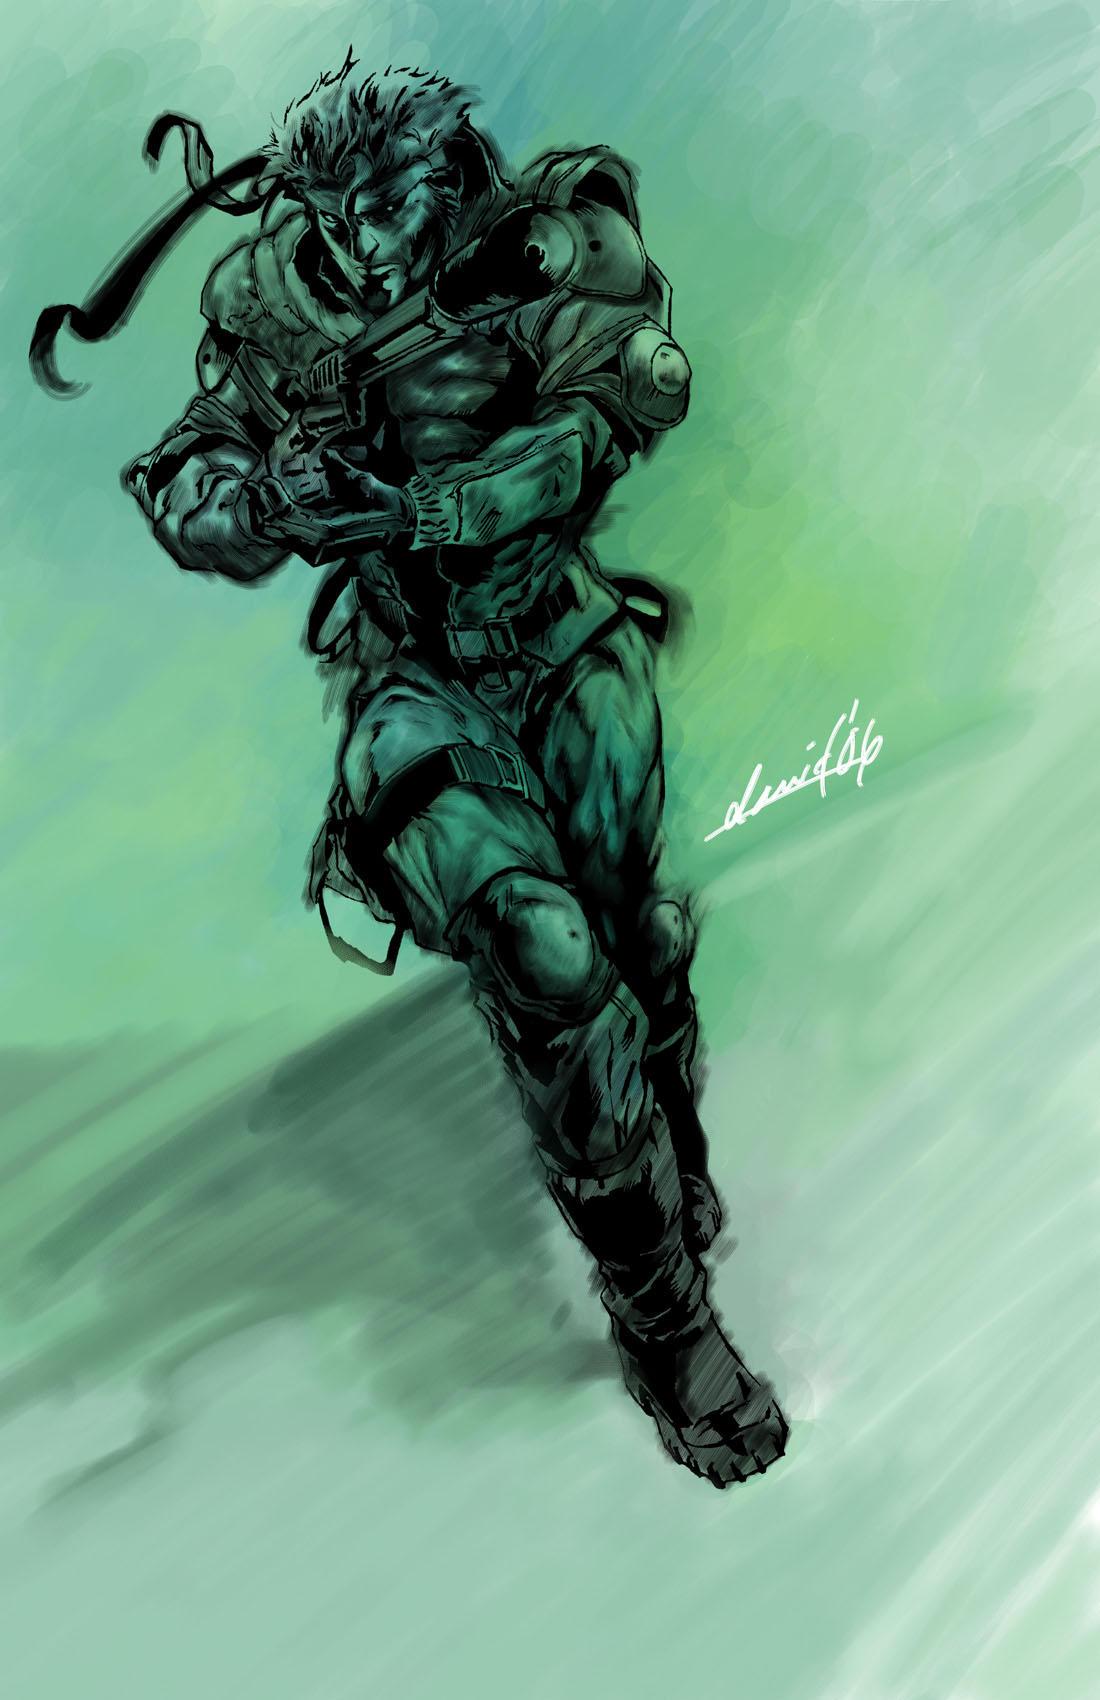 METAL_GEAR__sketch_by_dwinbotp.jpg